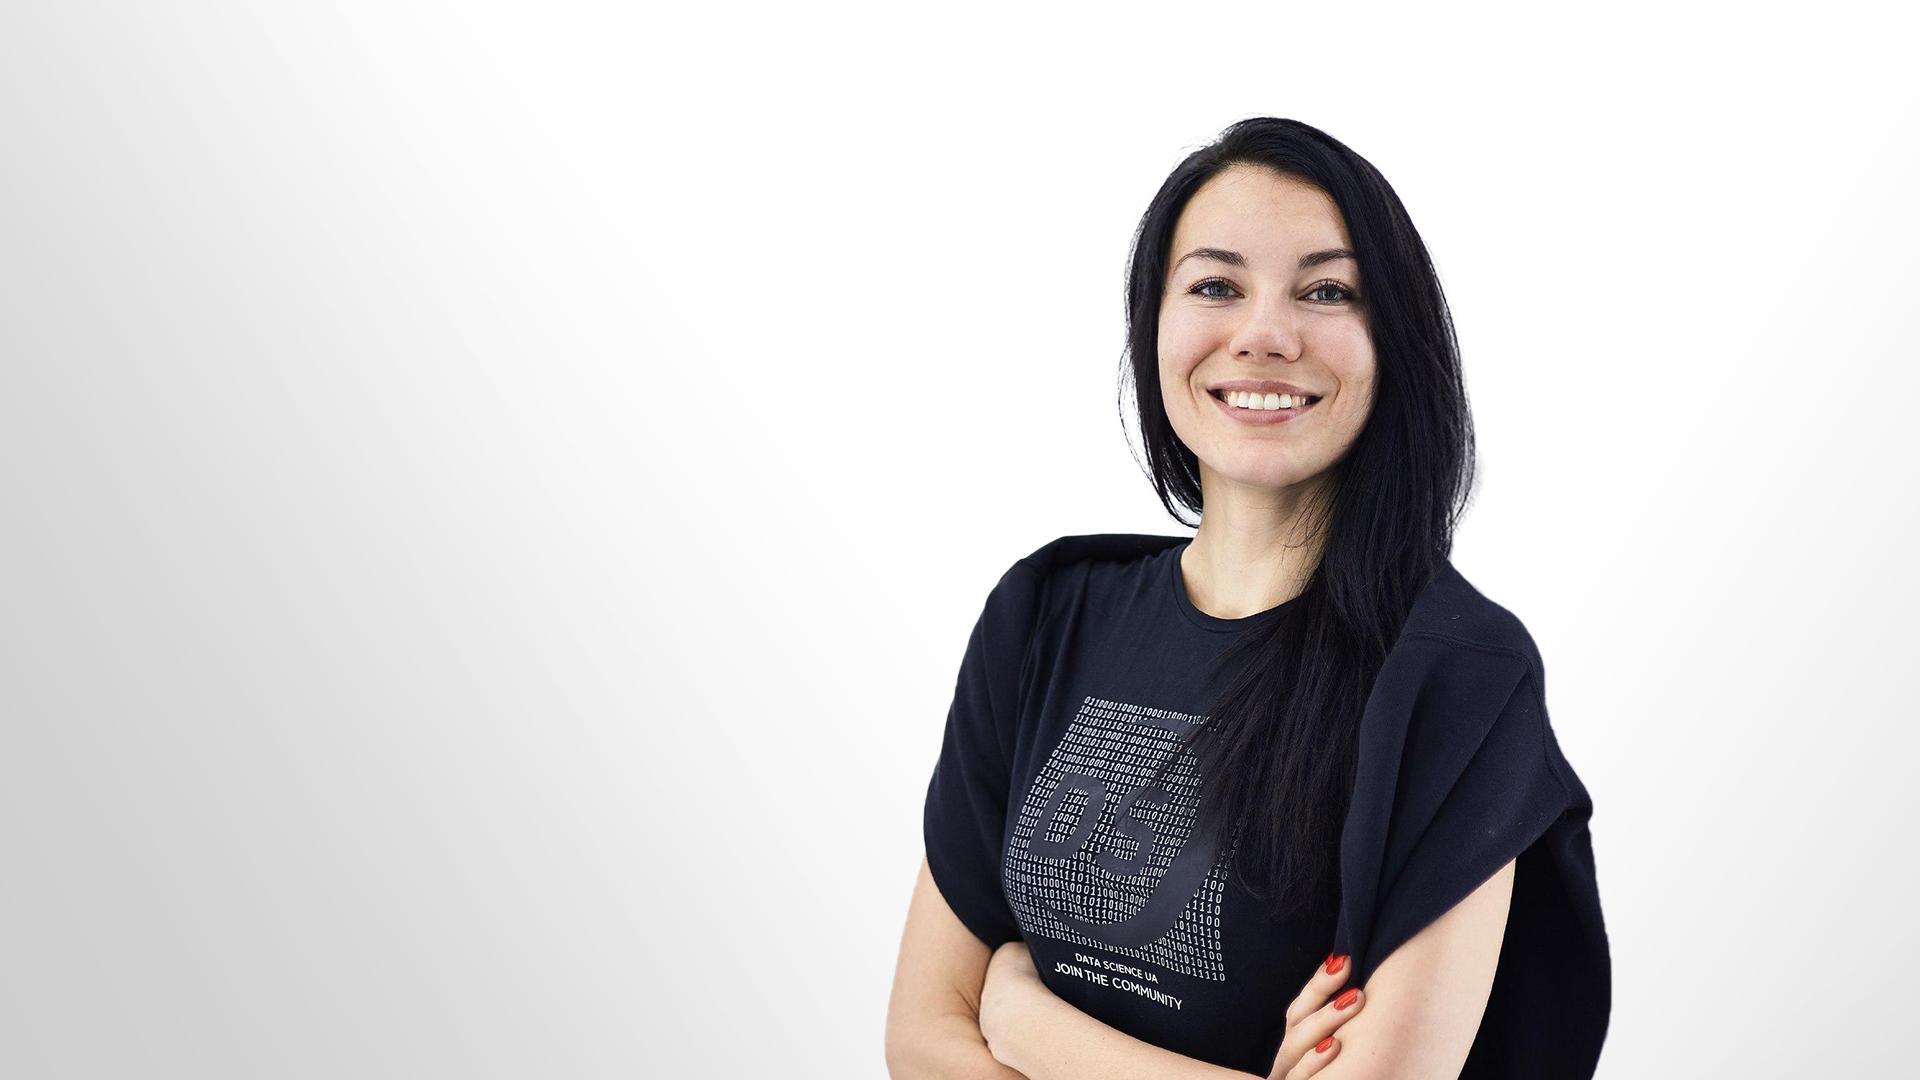 Interview with Aleksandra Sirovatko, CEO and Founder of Data Science UA